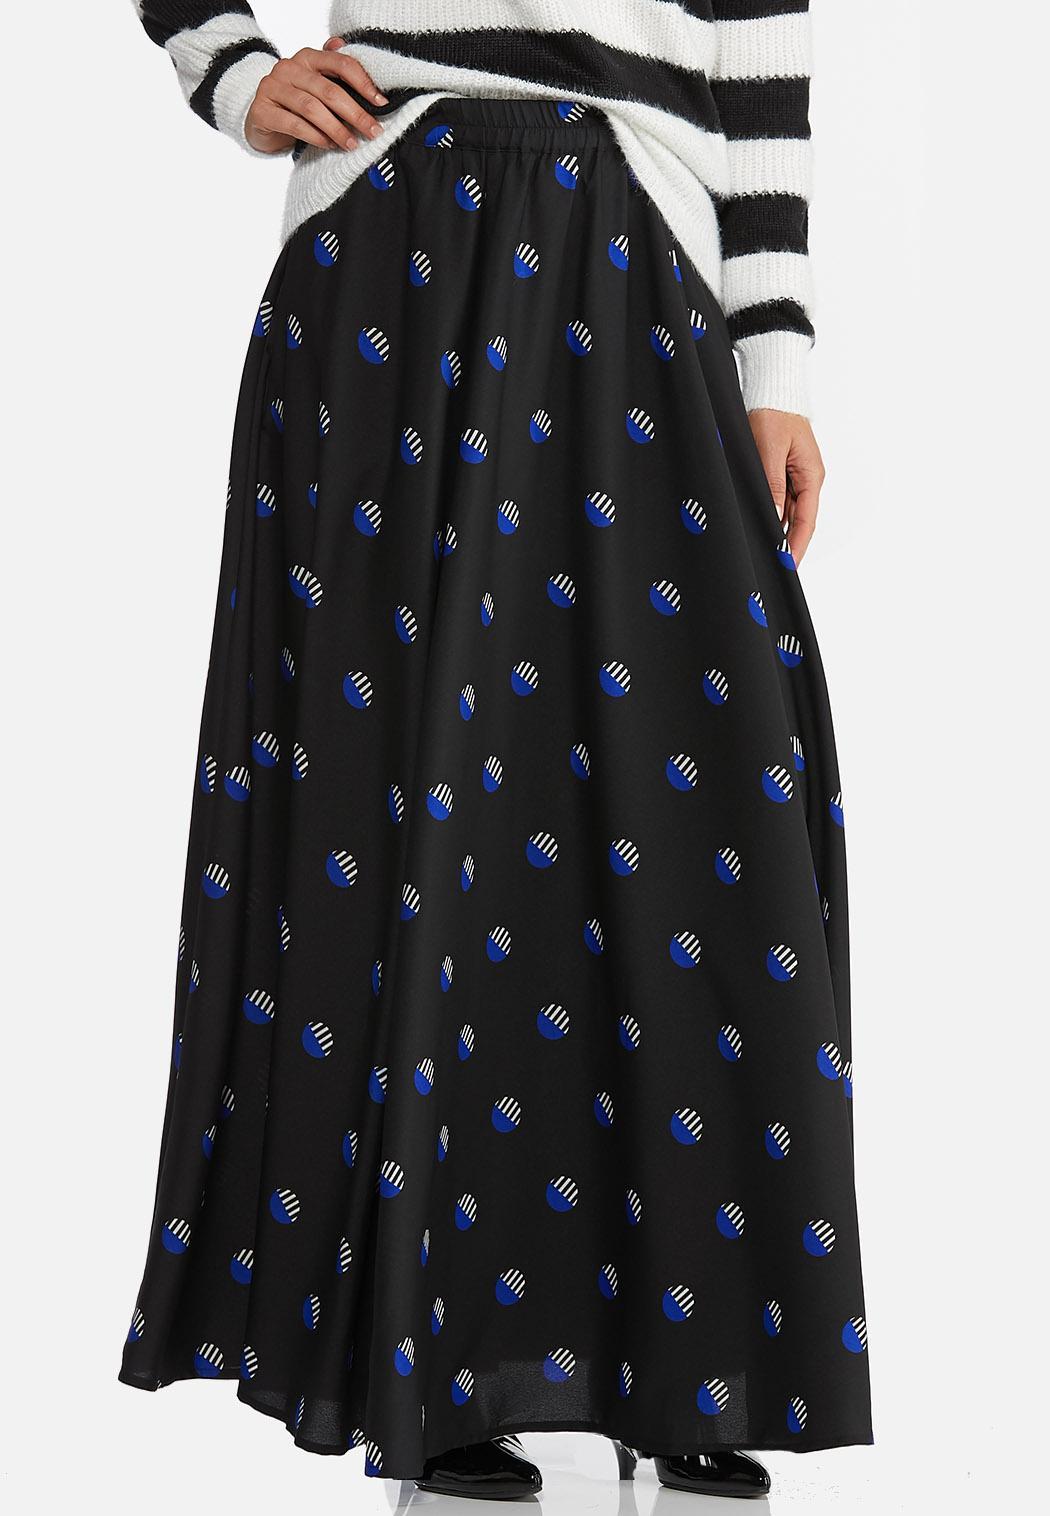 Deco Dot Maxi Skirt